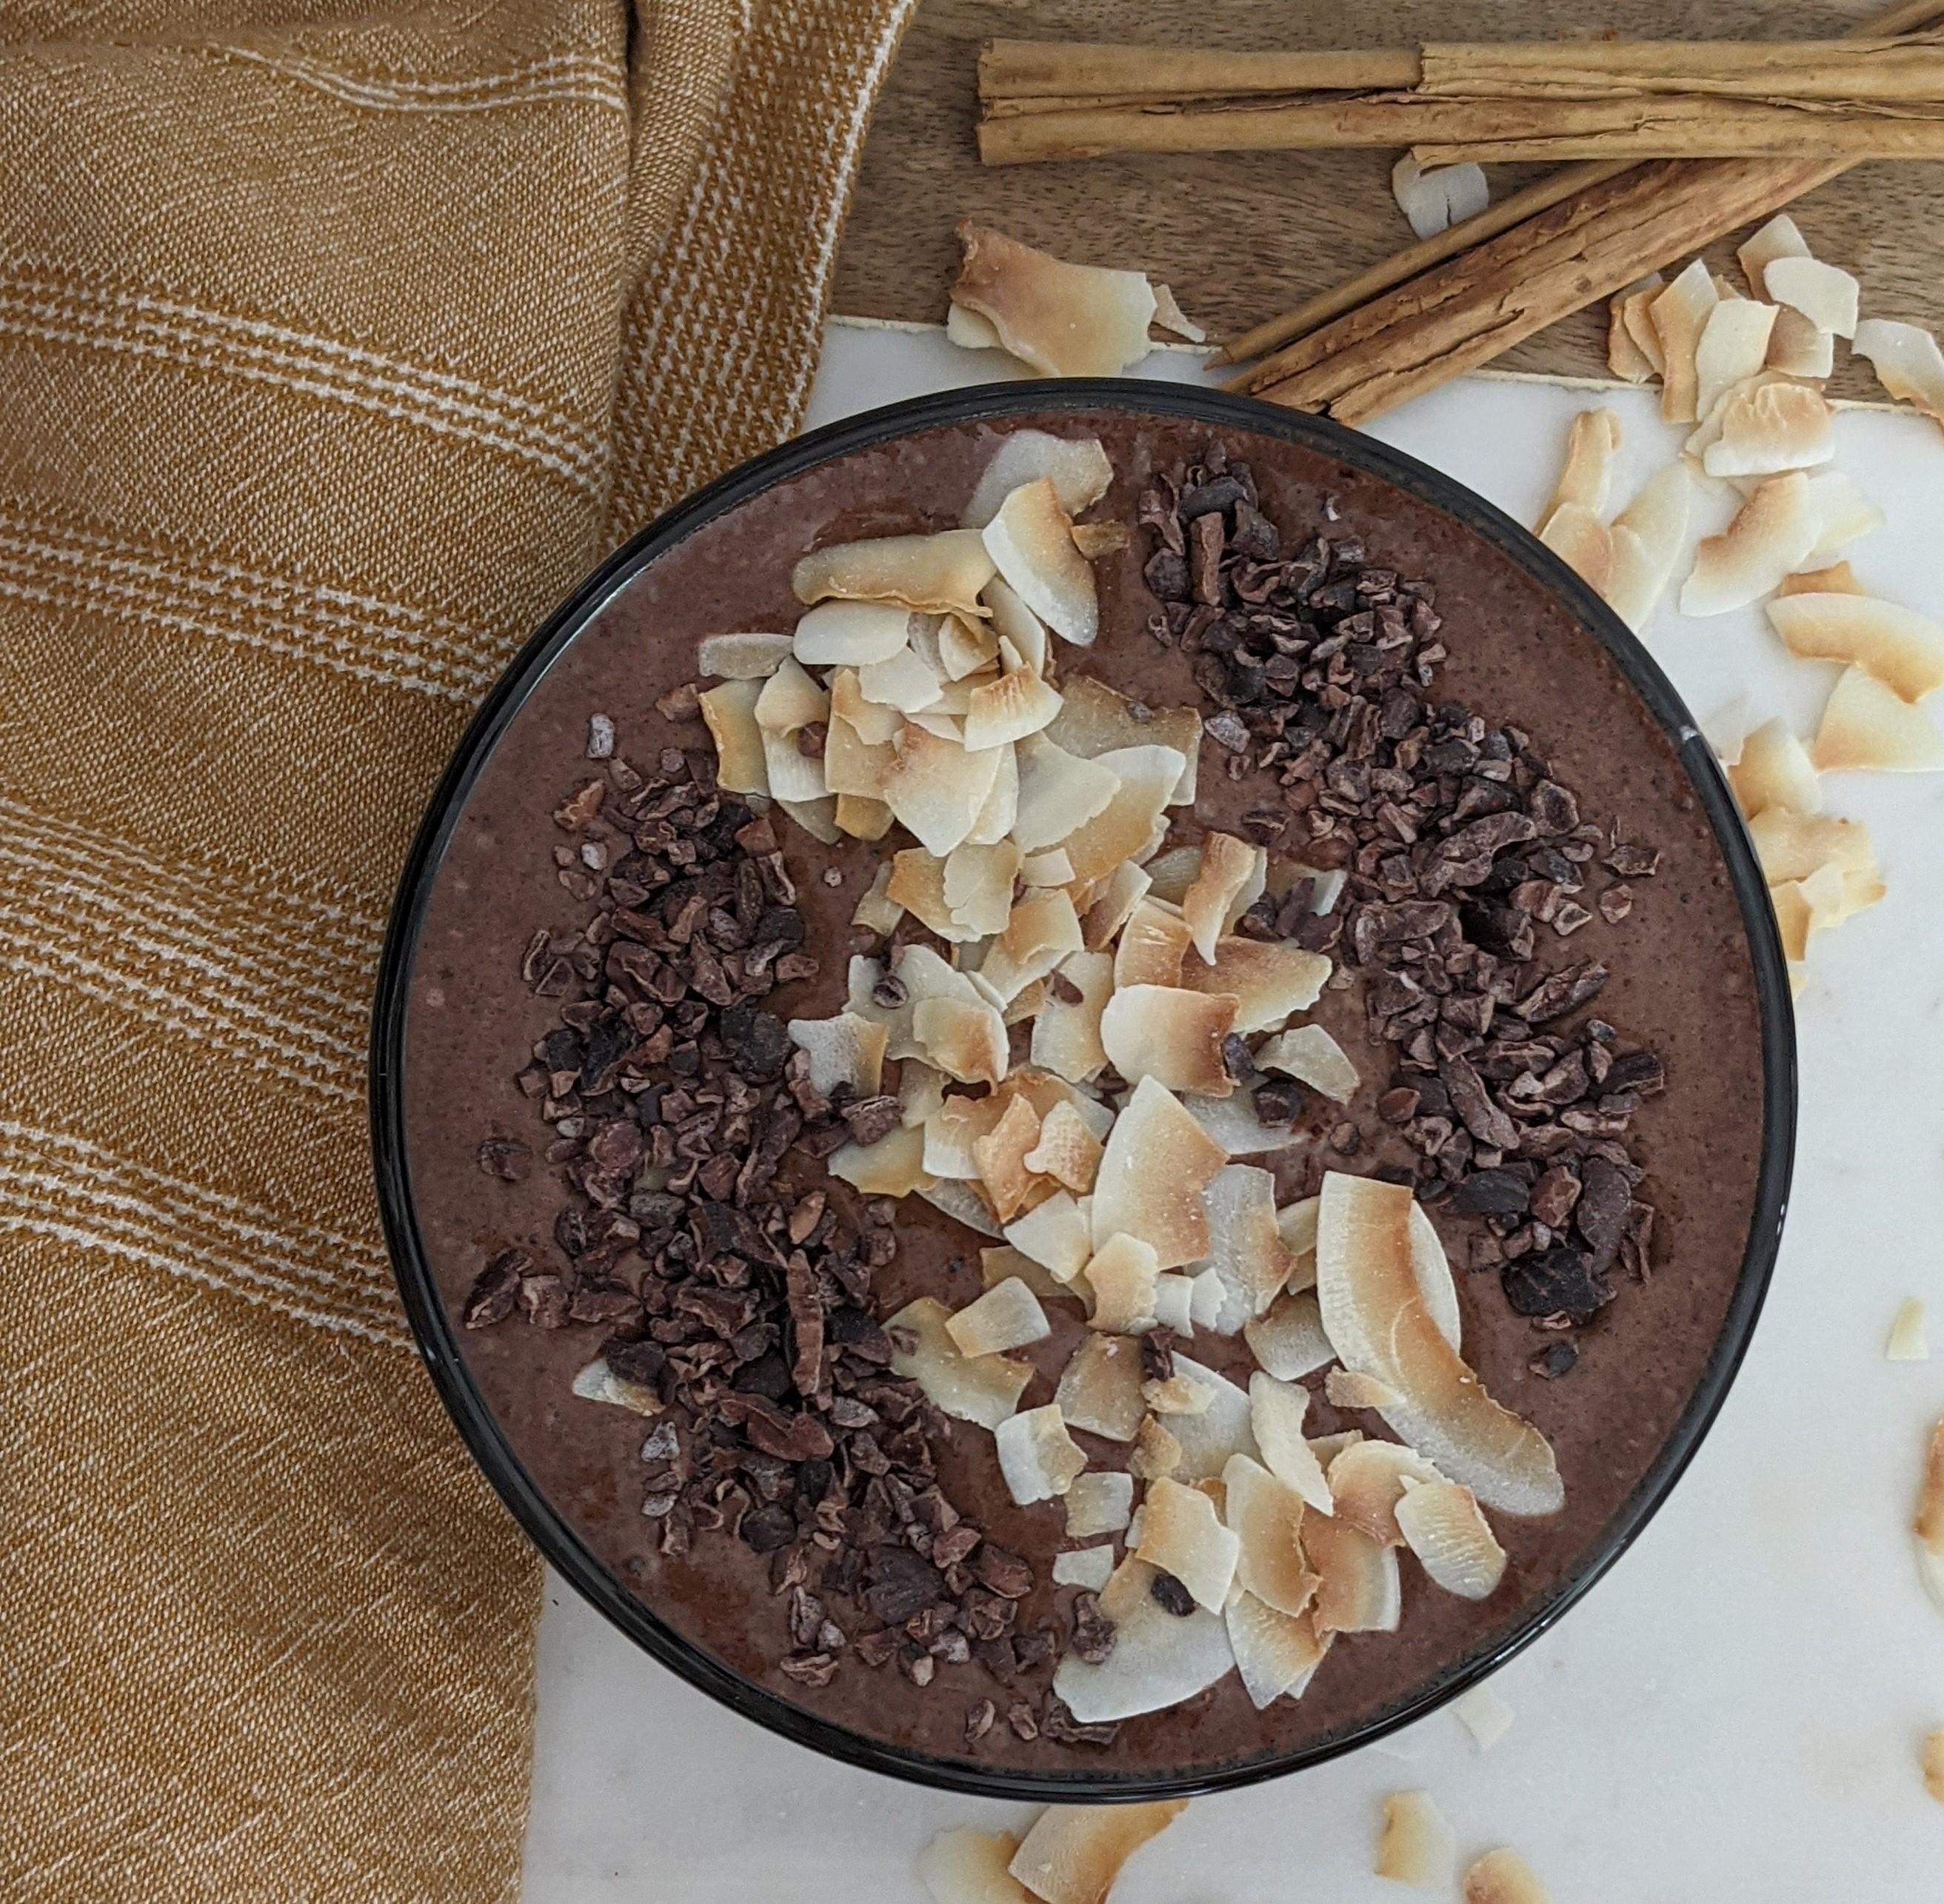 Chocolate Gelato Danielle Stadelman RDN